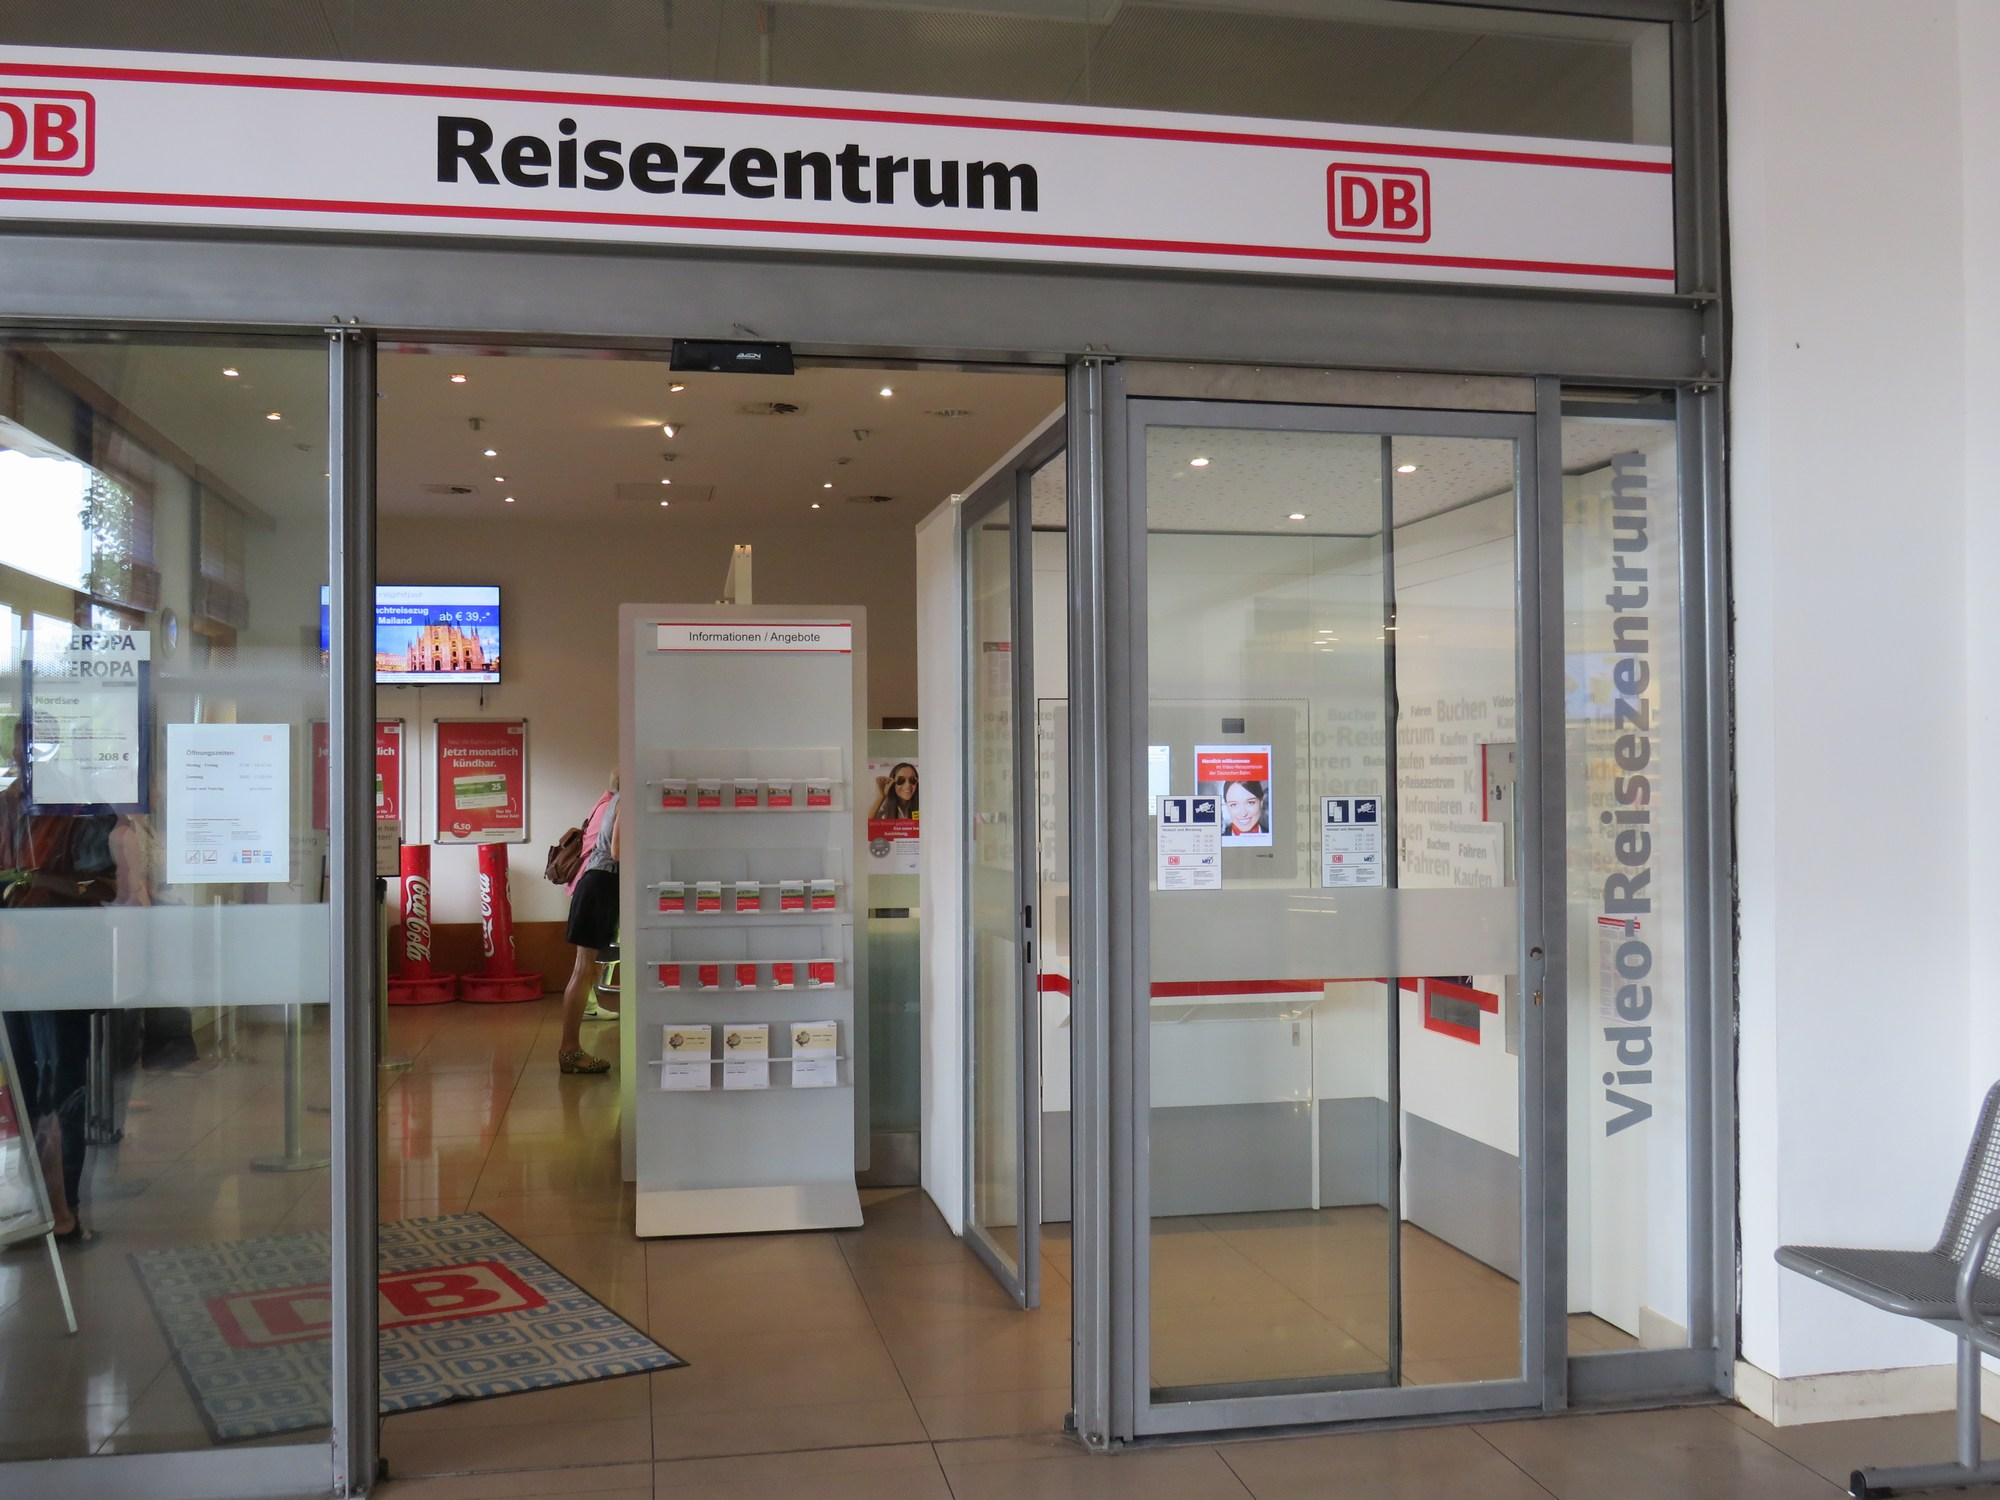 Db Reisezentrum Mönchengladbach